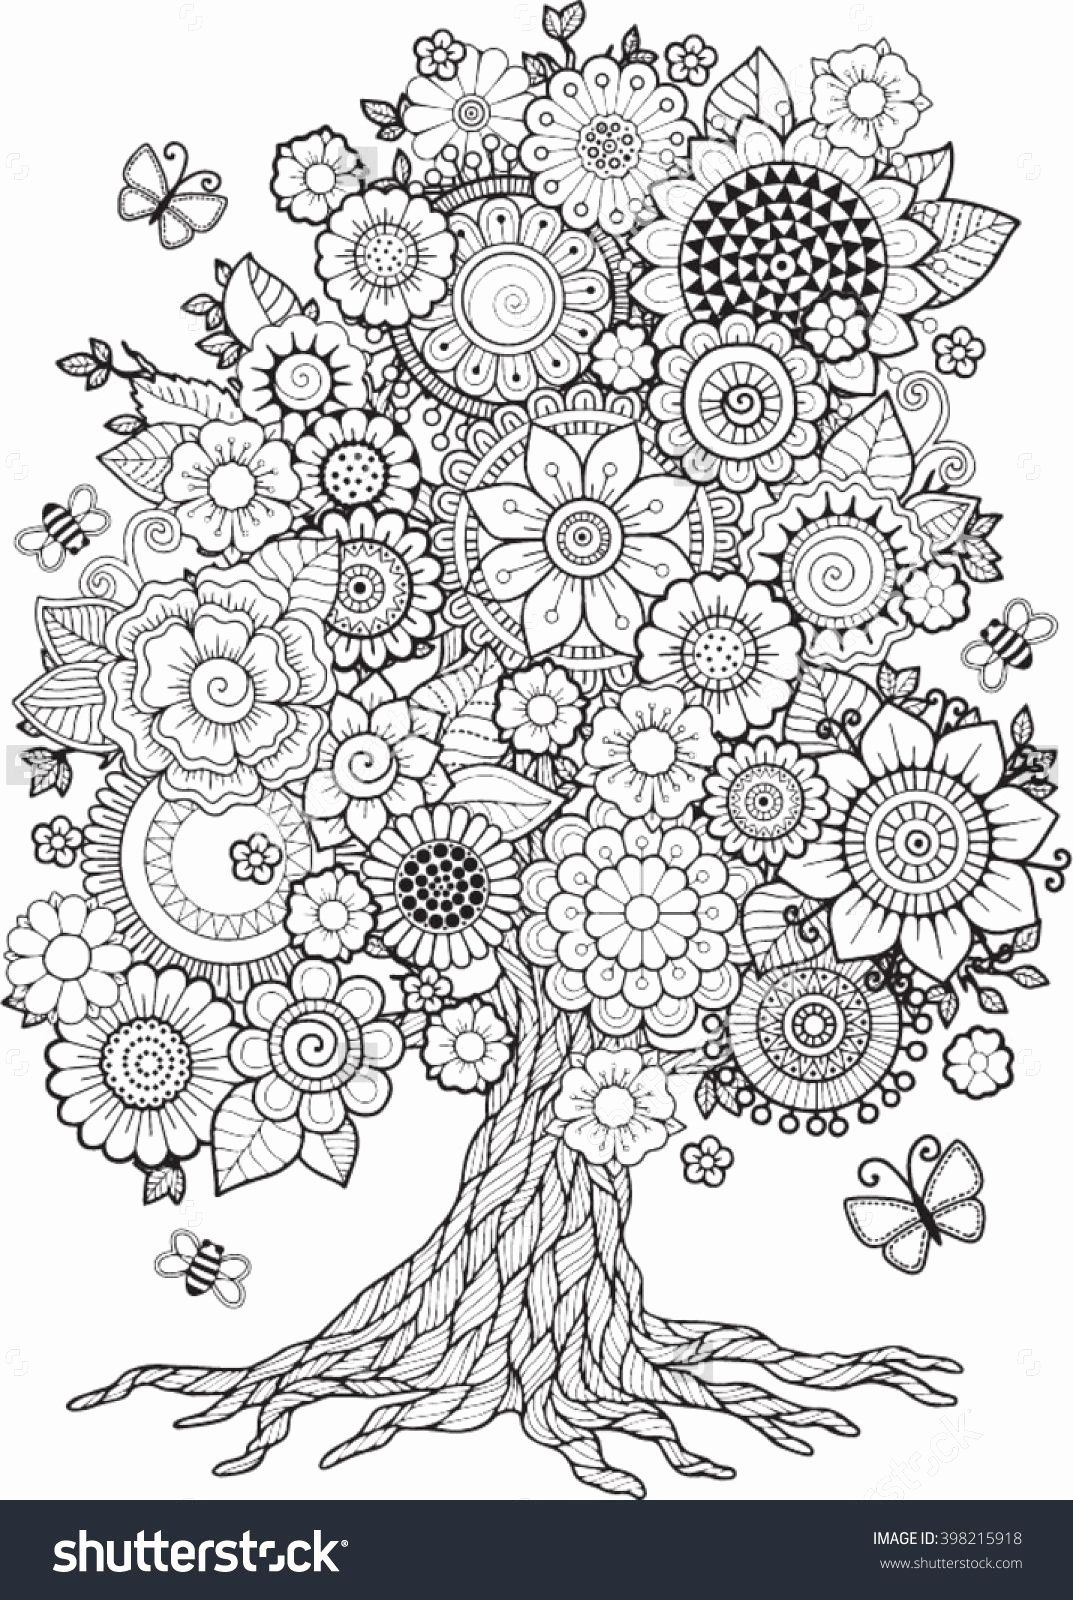 Coloring Book Vector Tree Elegant Coloring Design Mandala Meditation Coloring Pages Mandala Coloring Pages Coloring Books Mandala Coloring